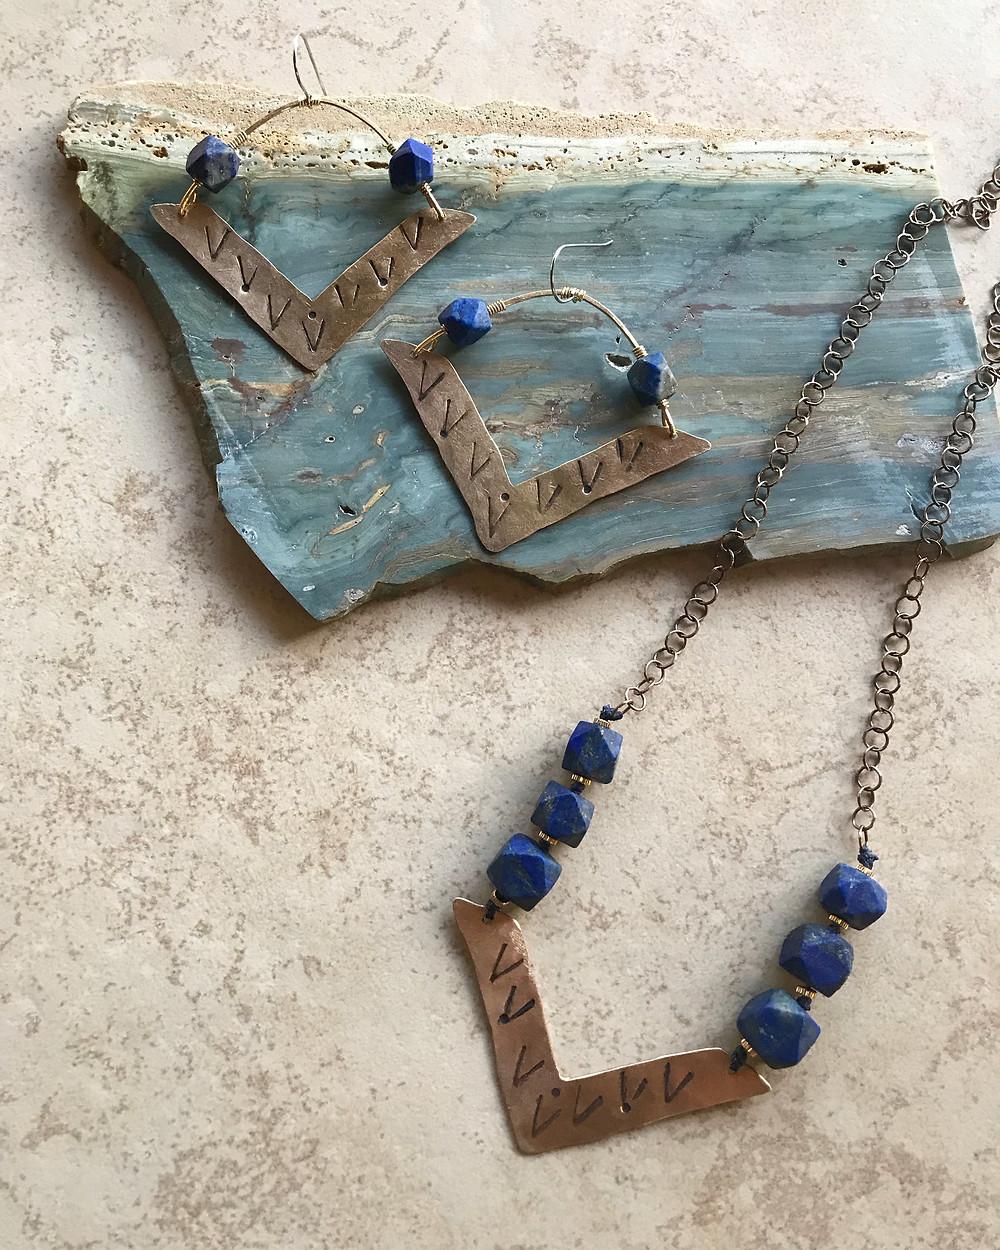 Brass Elements in Lapis Lazuli, hand-cut, hand-stamped.